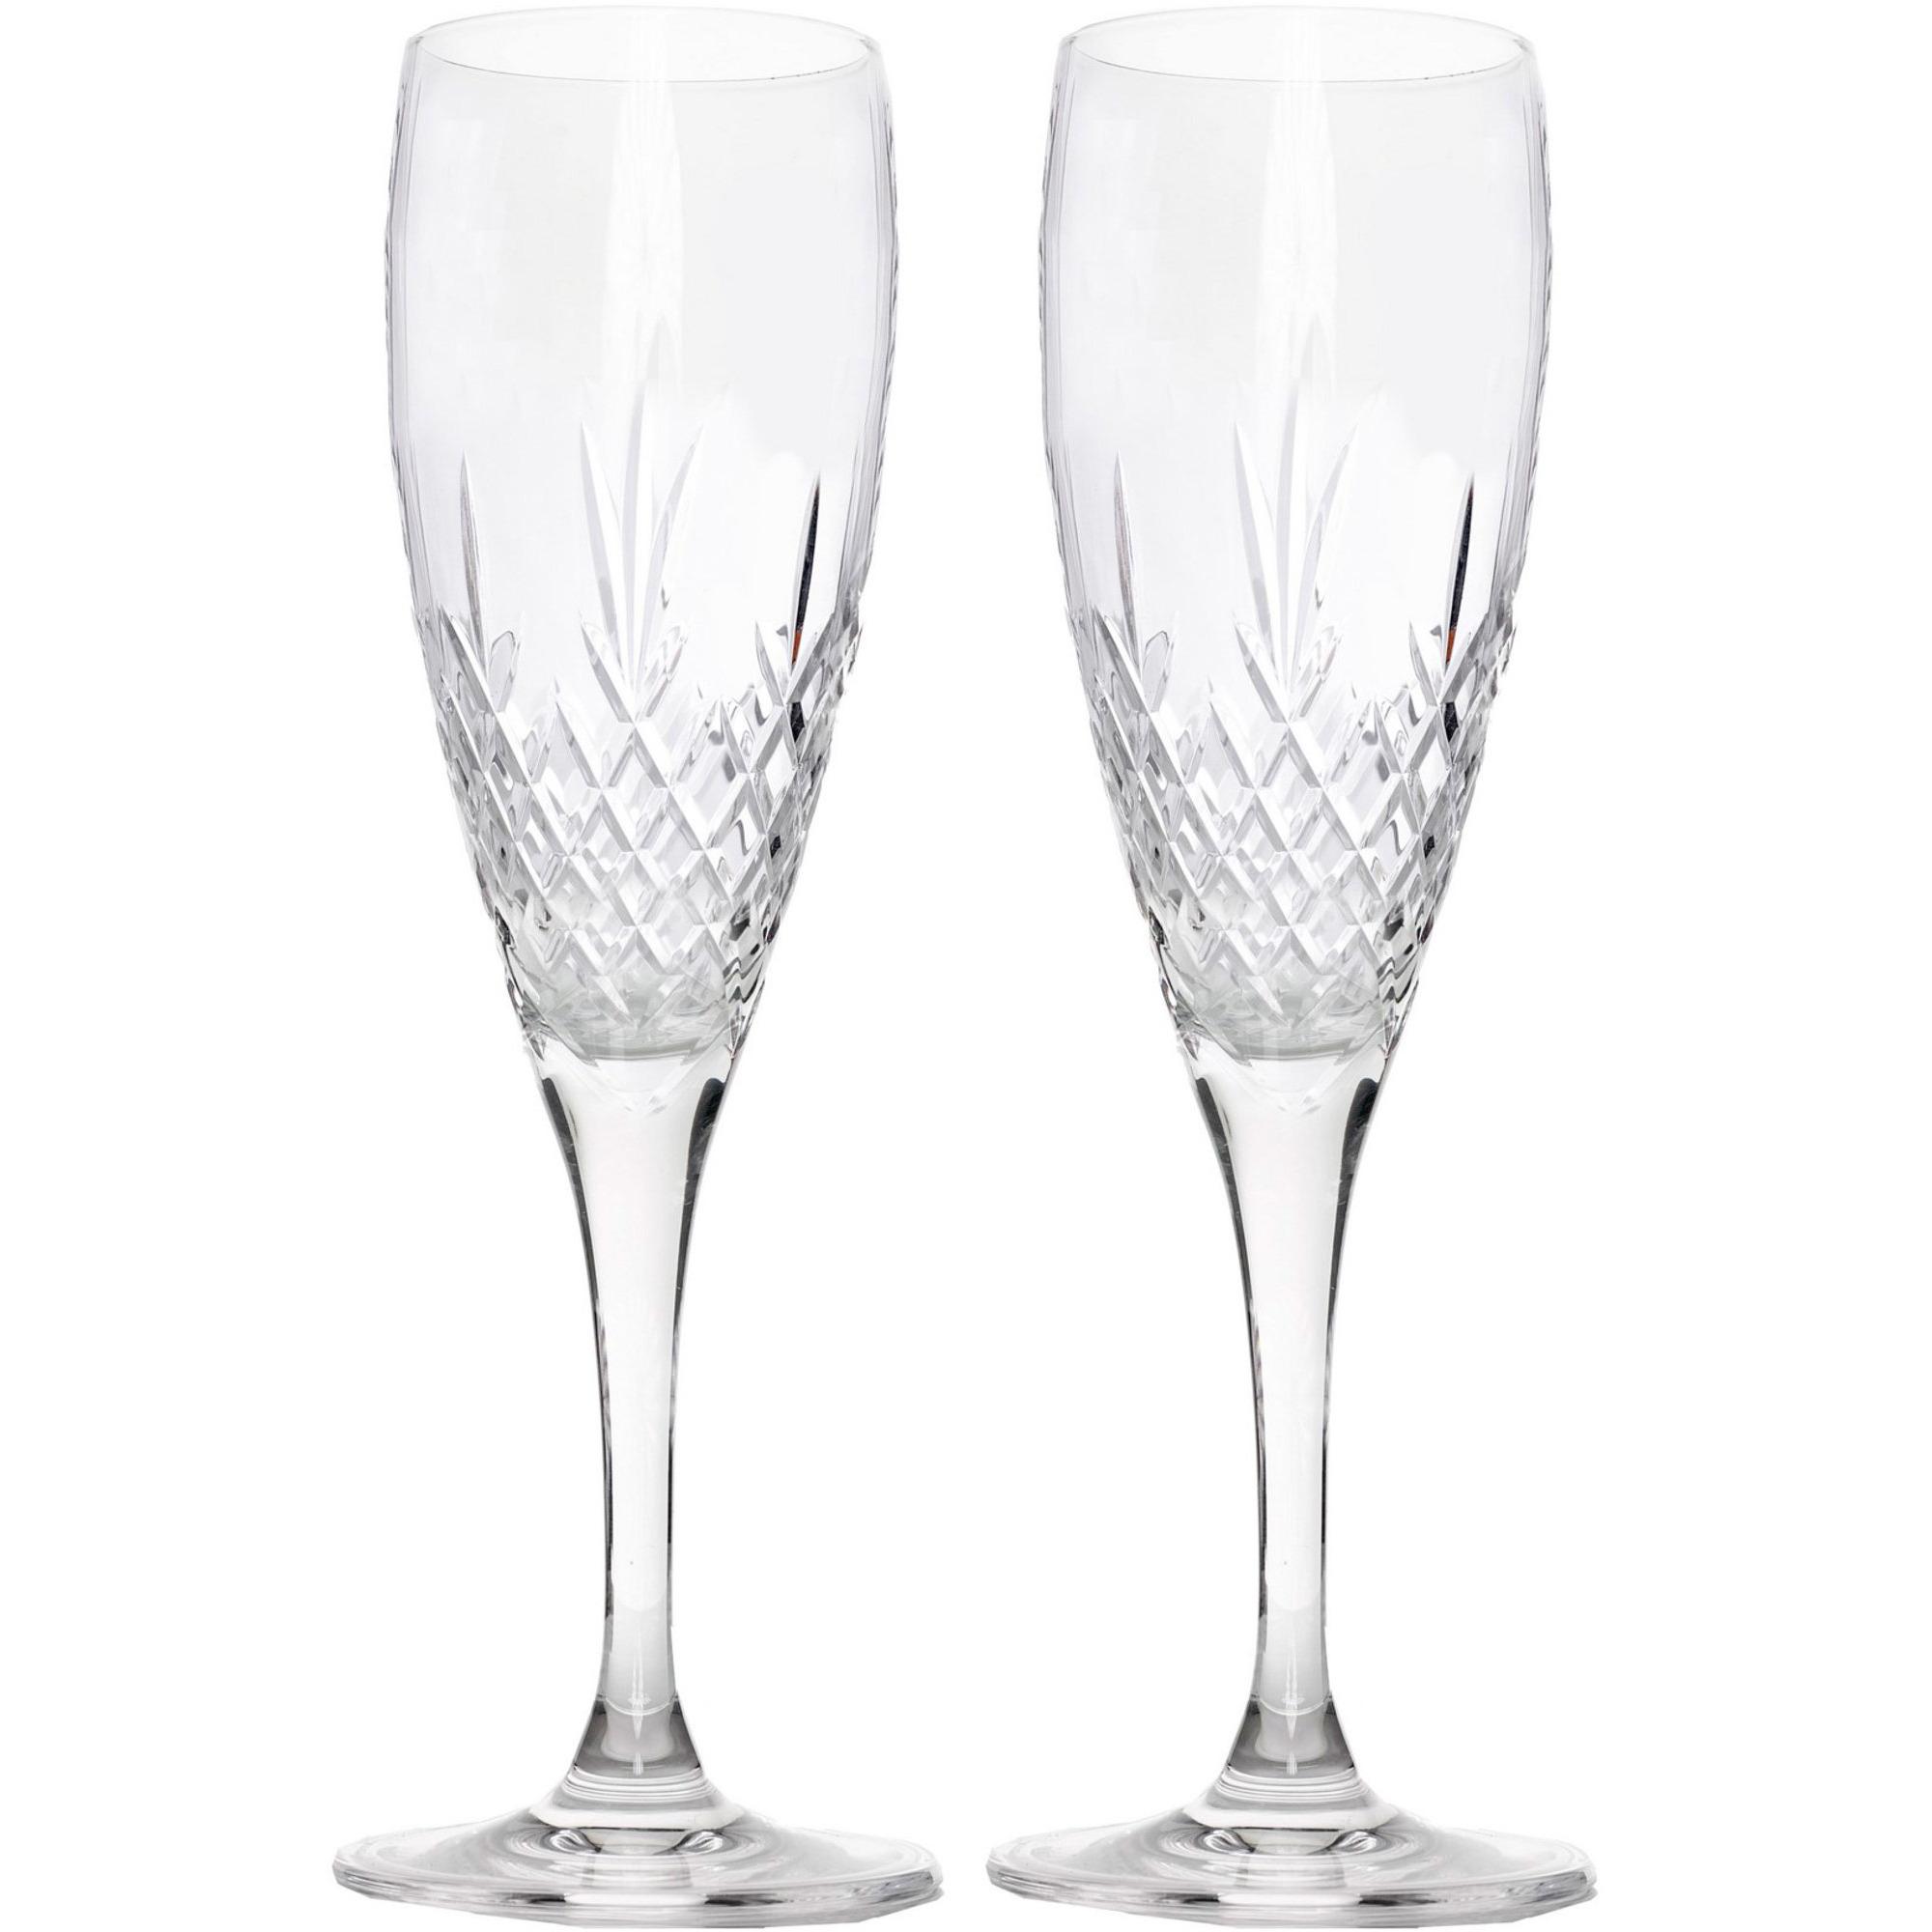 Frederik Bagger Crispy Celebration champagneglas 2 st.